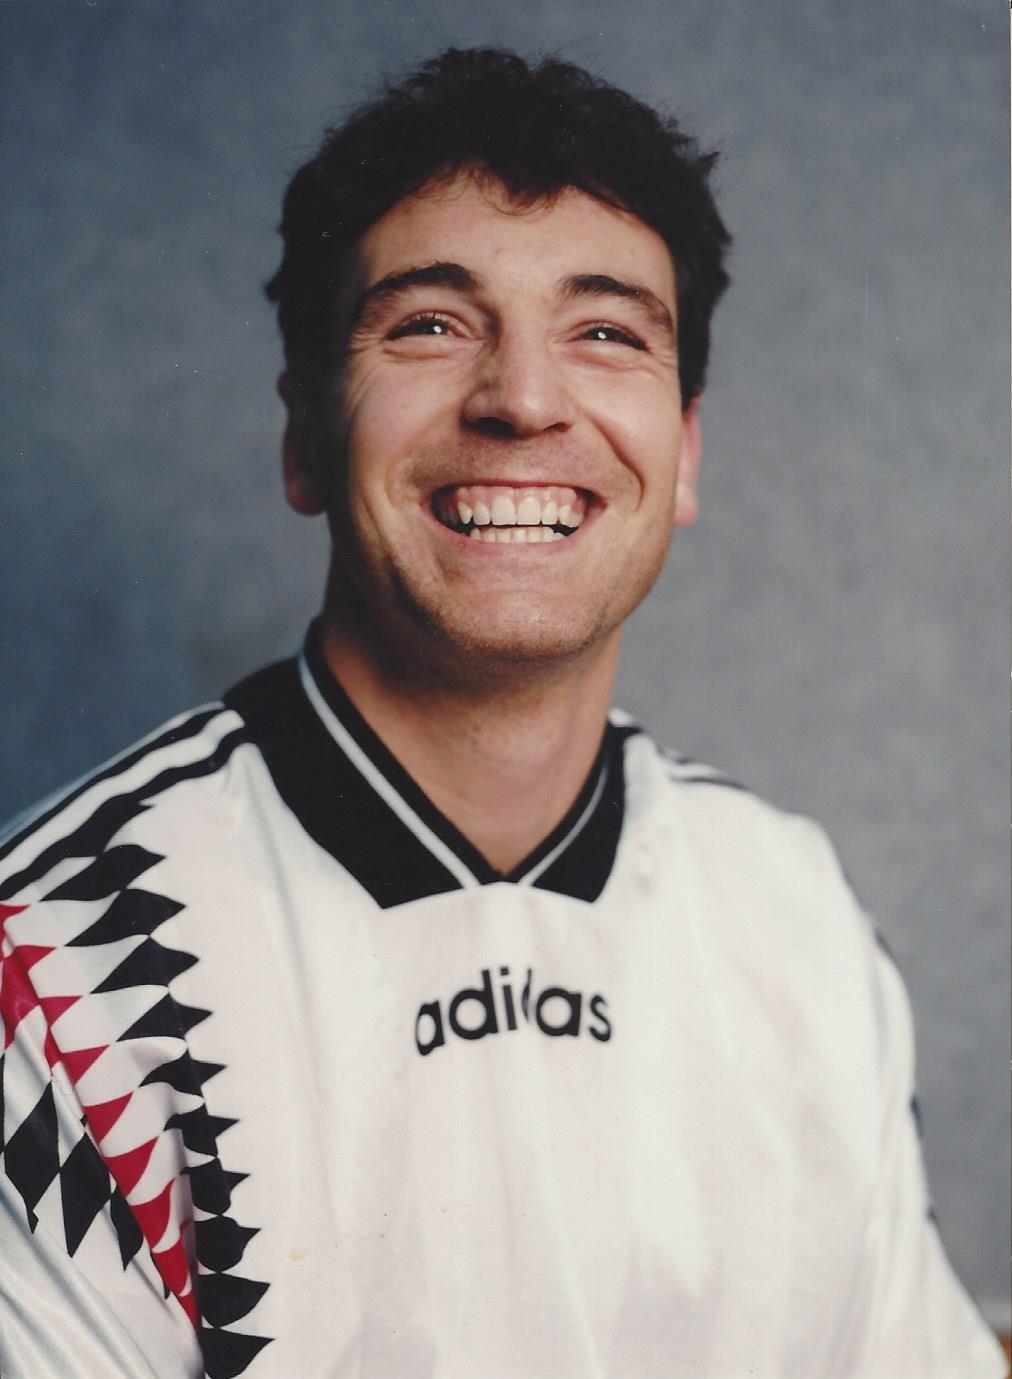 Melbourne Soccer: The Full Moorabbin City 1995 Photo Gallery